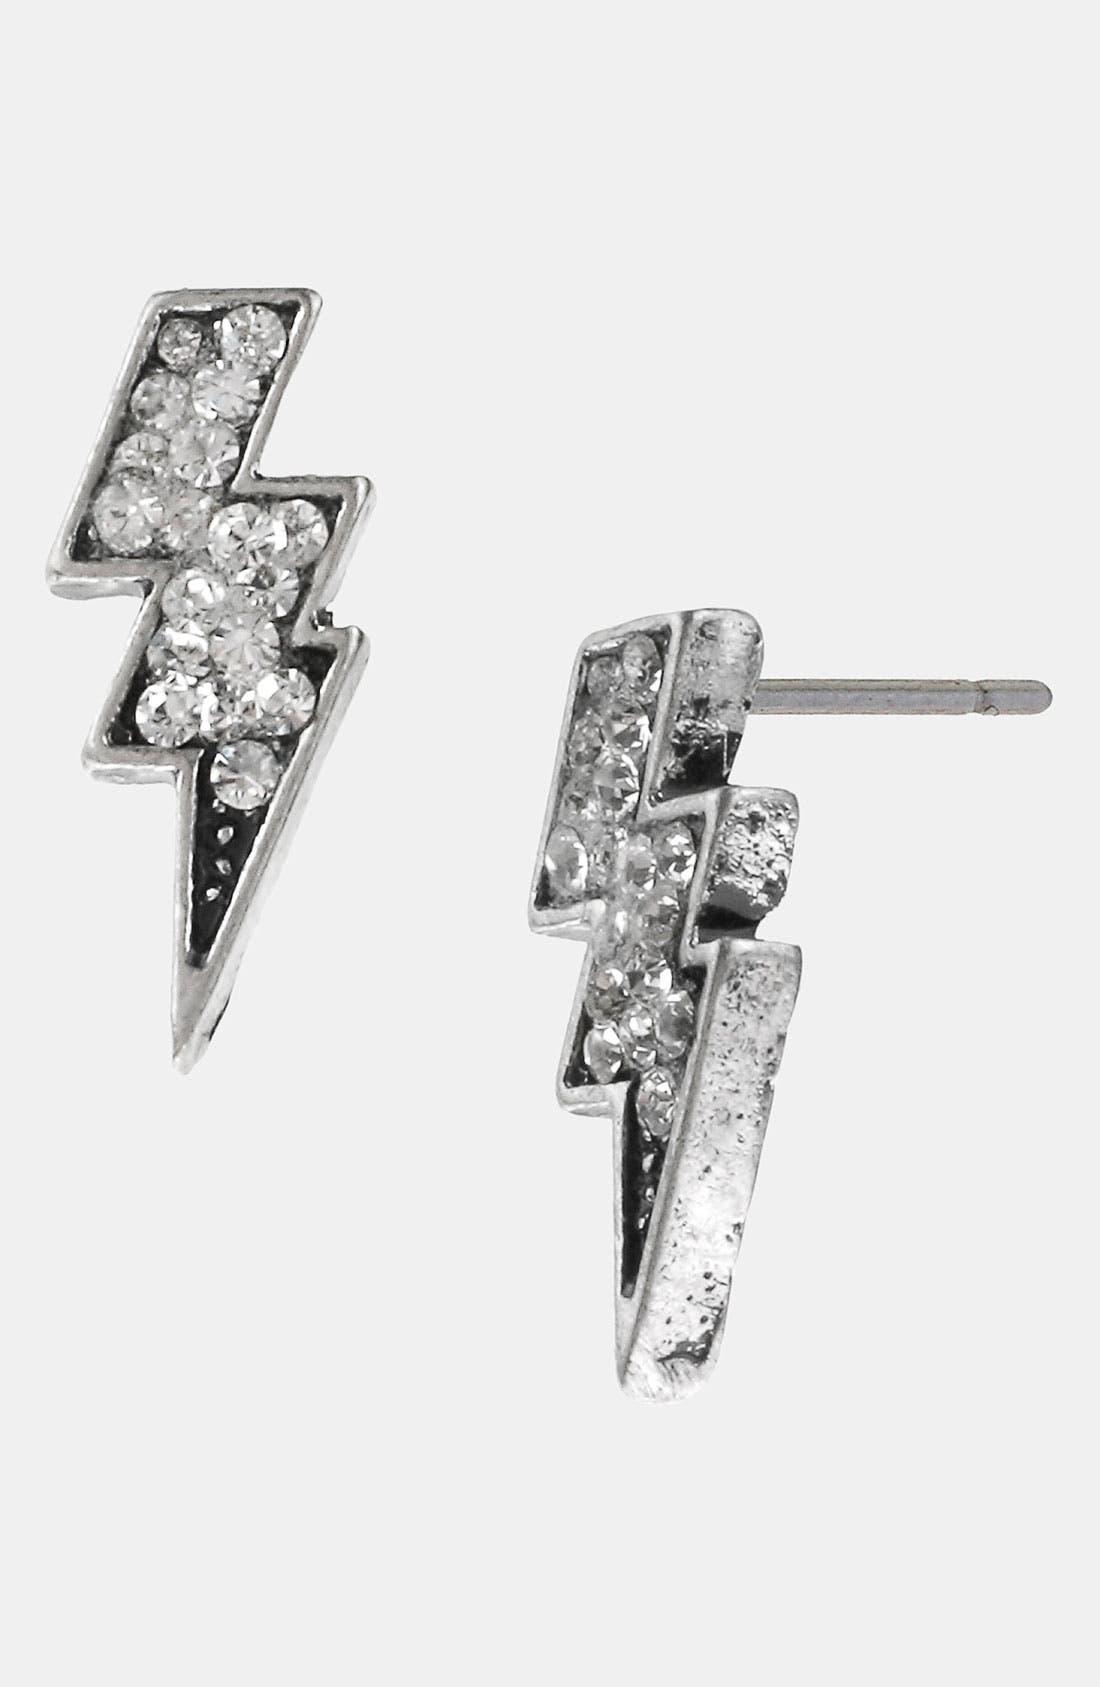 Main Image - Betsey Johnson 'Black Label' Crystal Bolt Stud Earrings